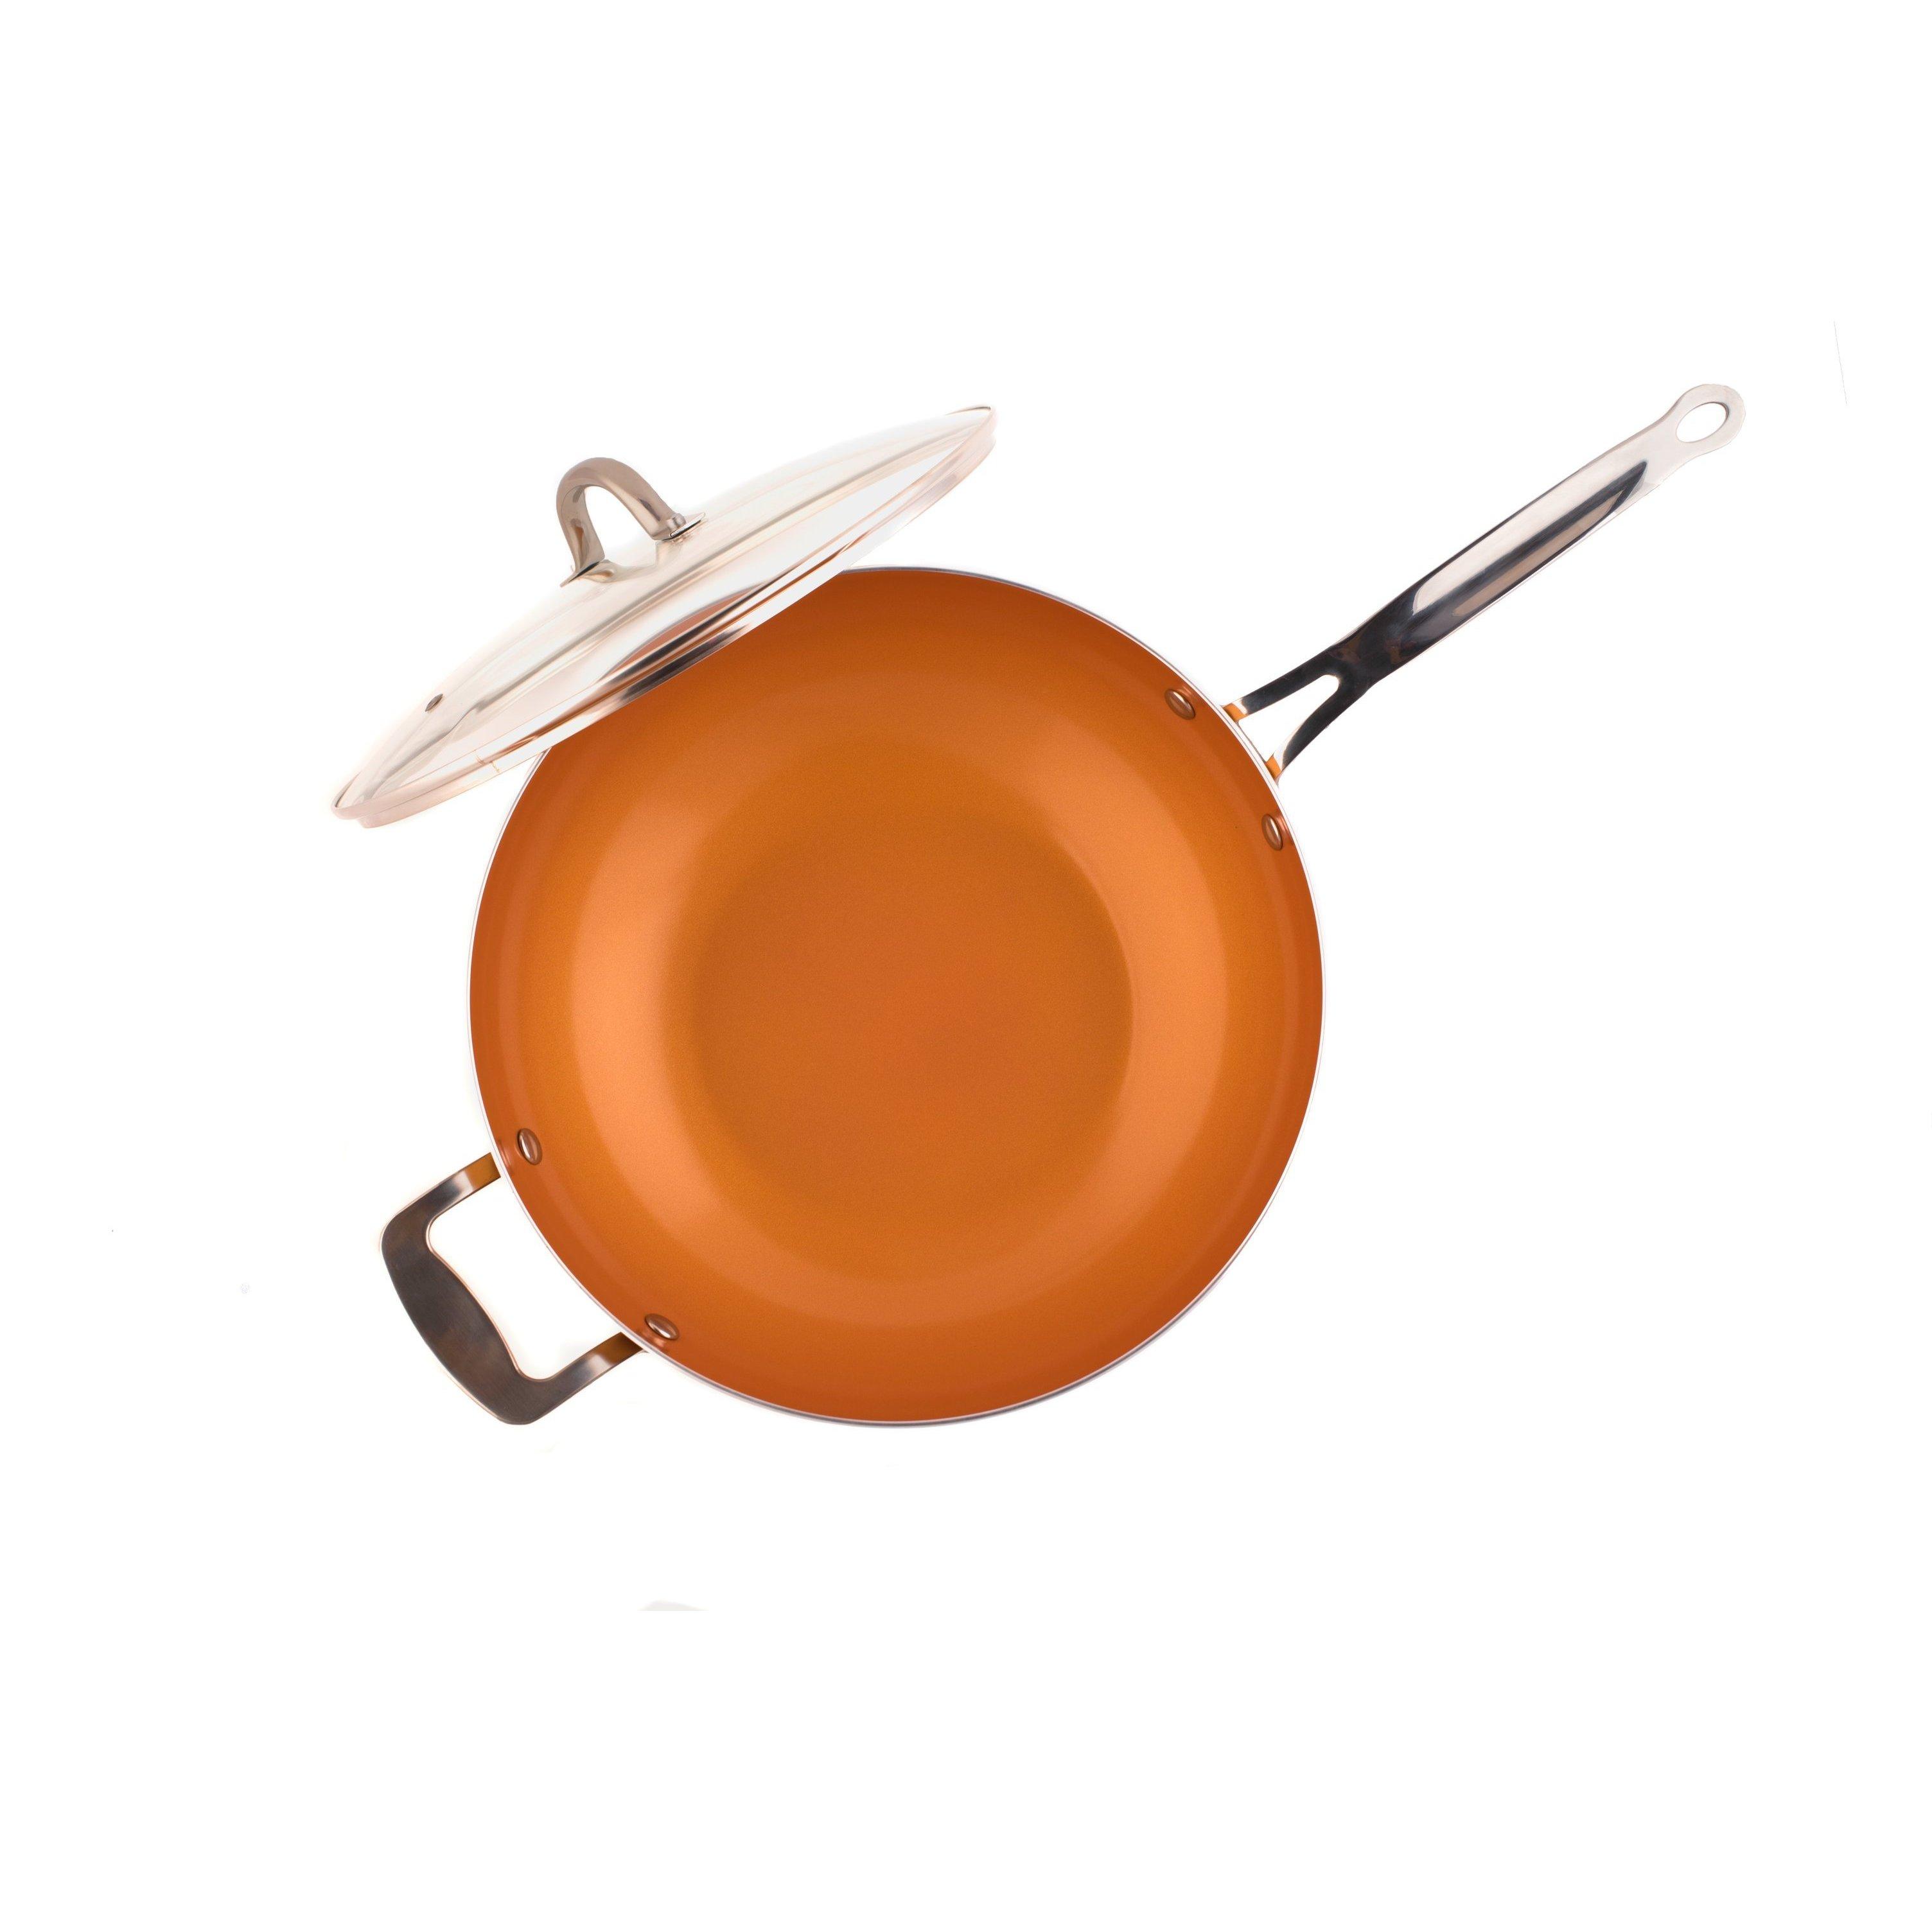 Original Copper Pan 12 Non-Stick Wok with Lid 12